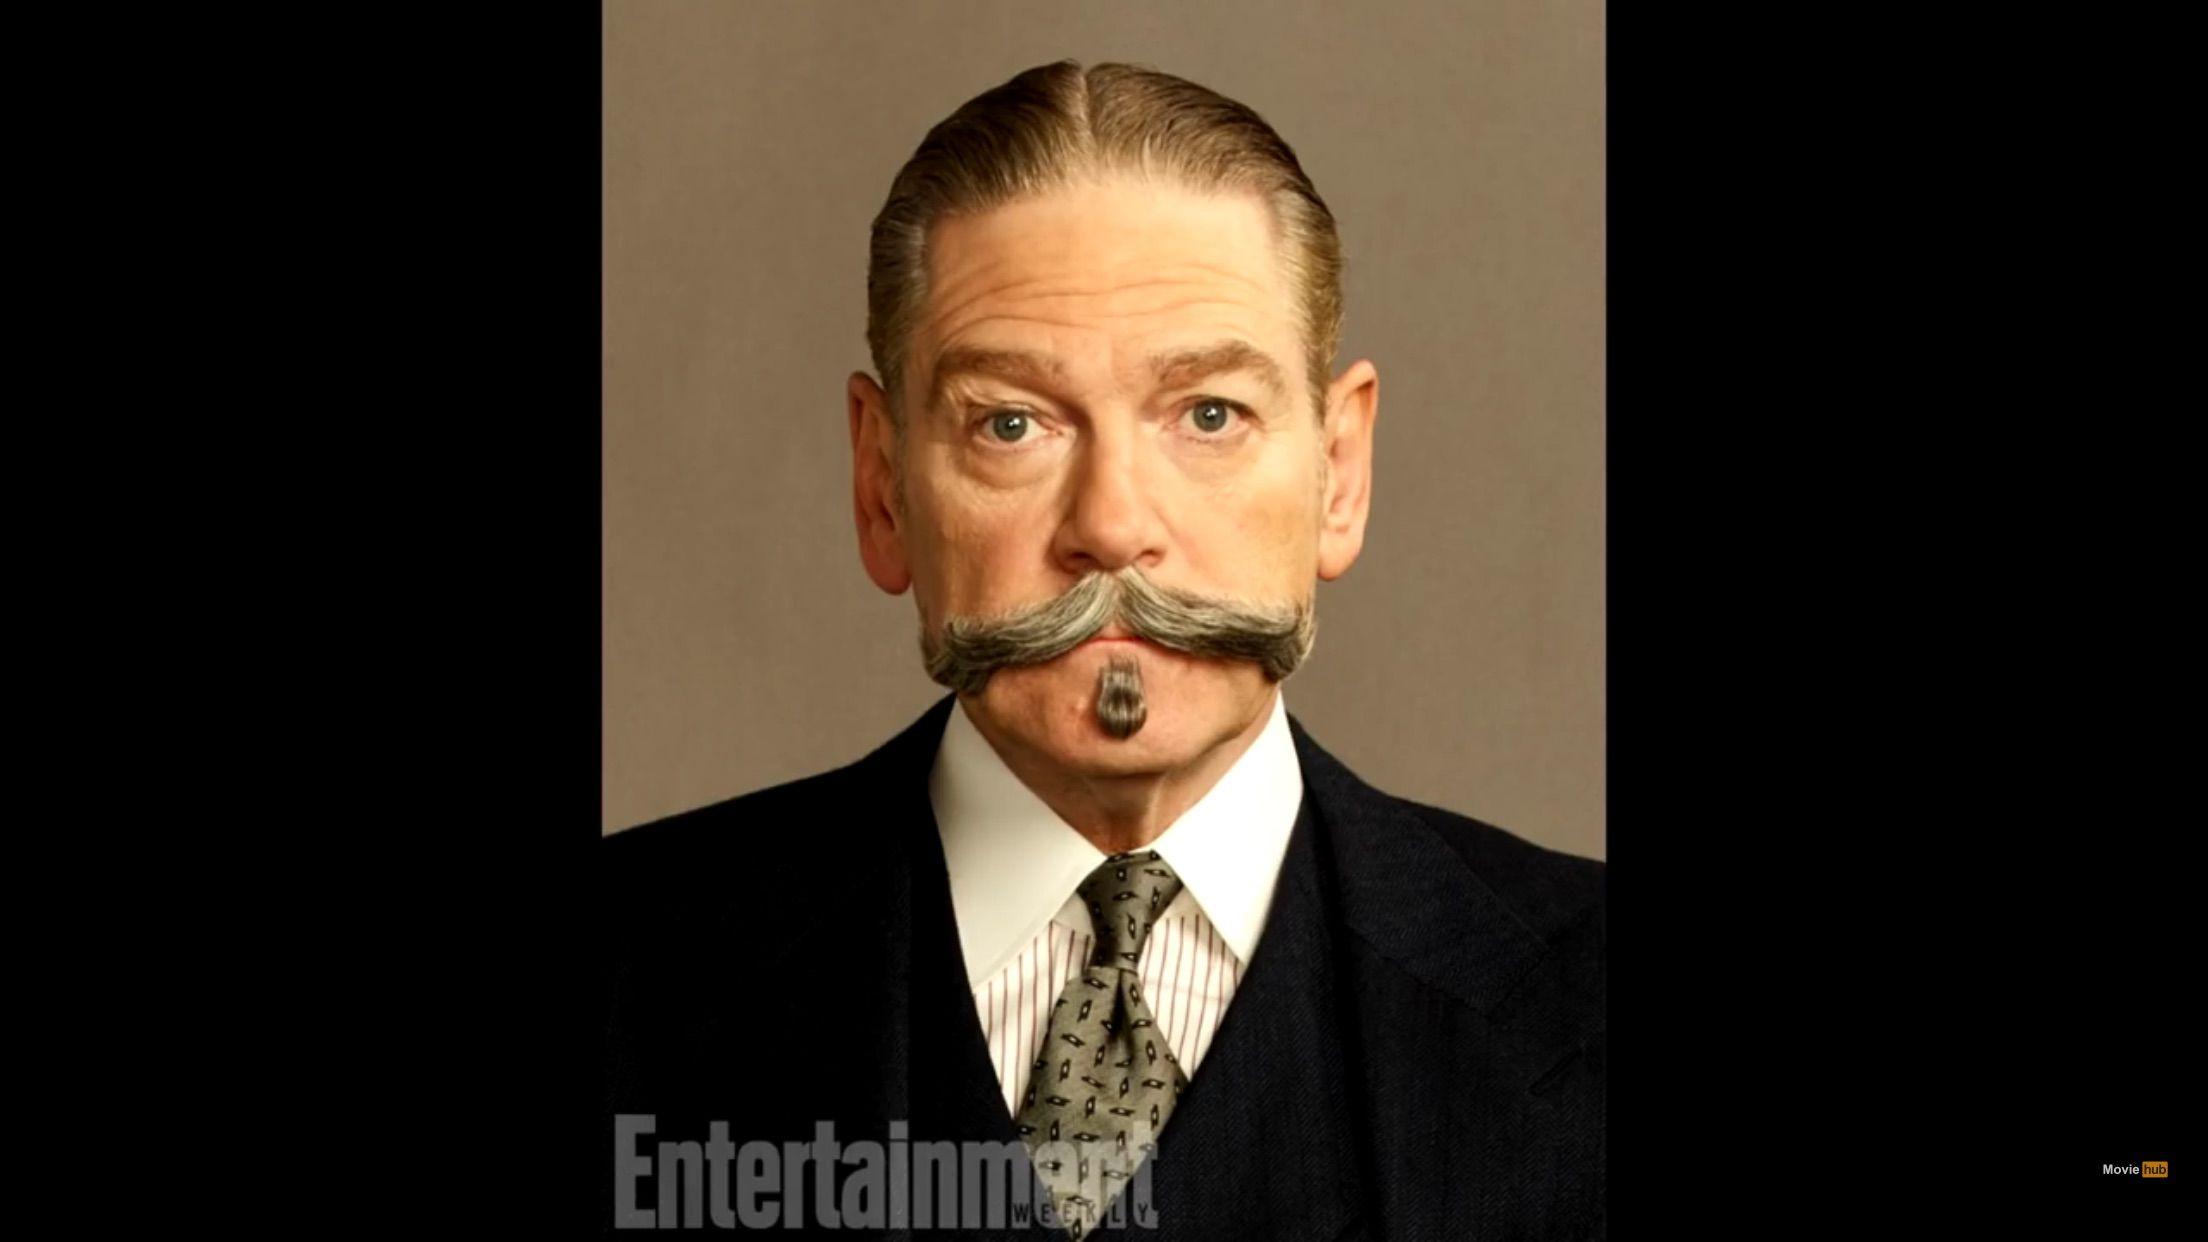 2017 Hercule Poirot movie. | Poirot | Pinterest | Hercule poirot ...